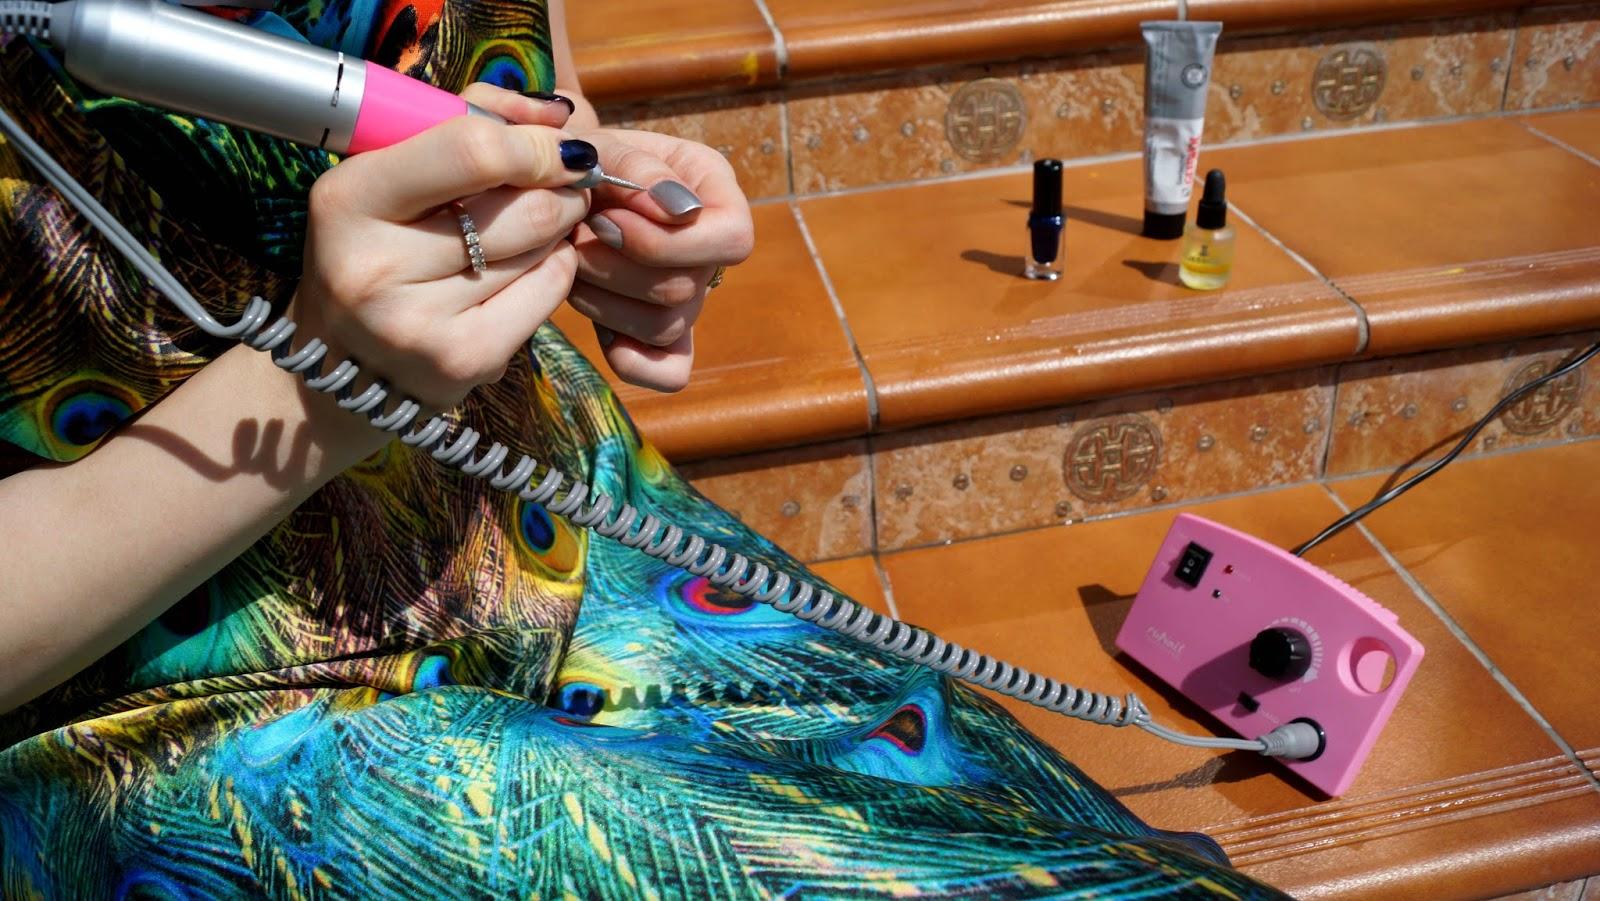 Аппарат для маникюра и педикюра runail